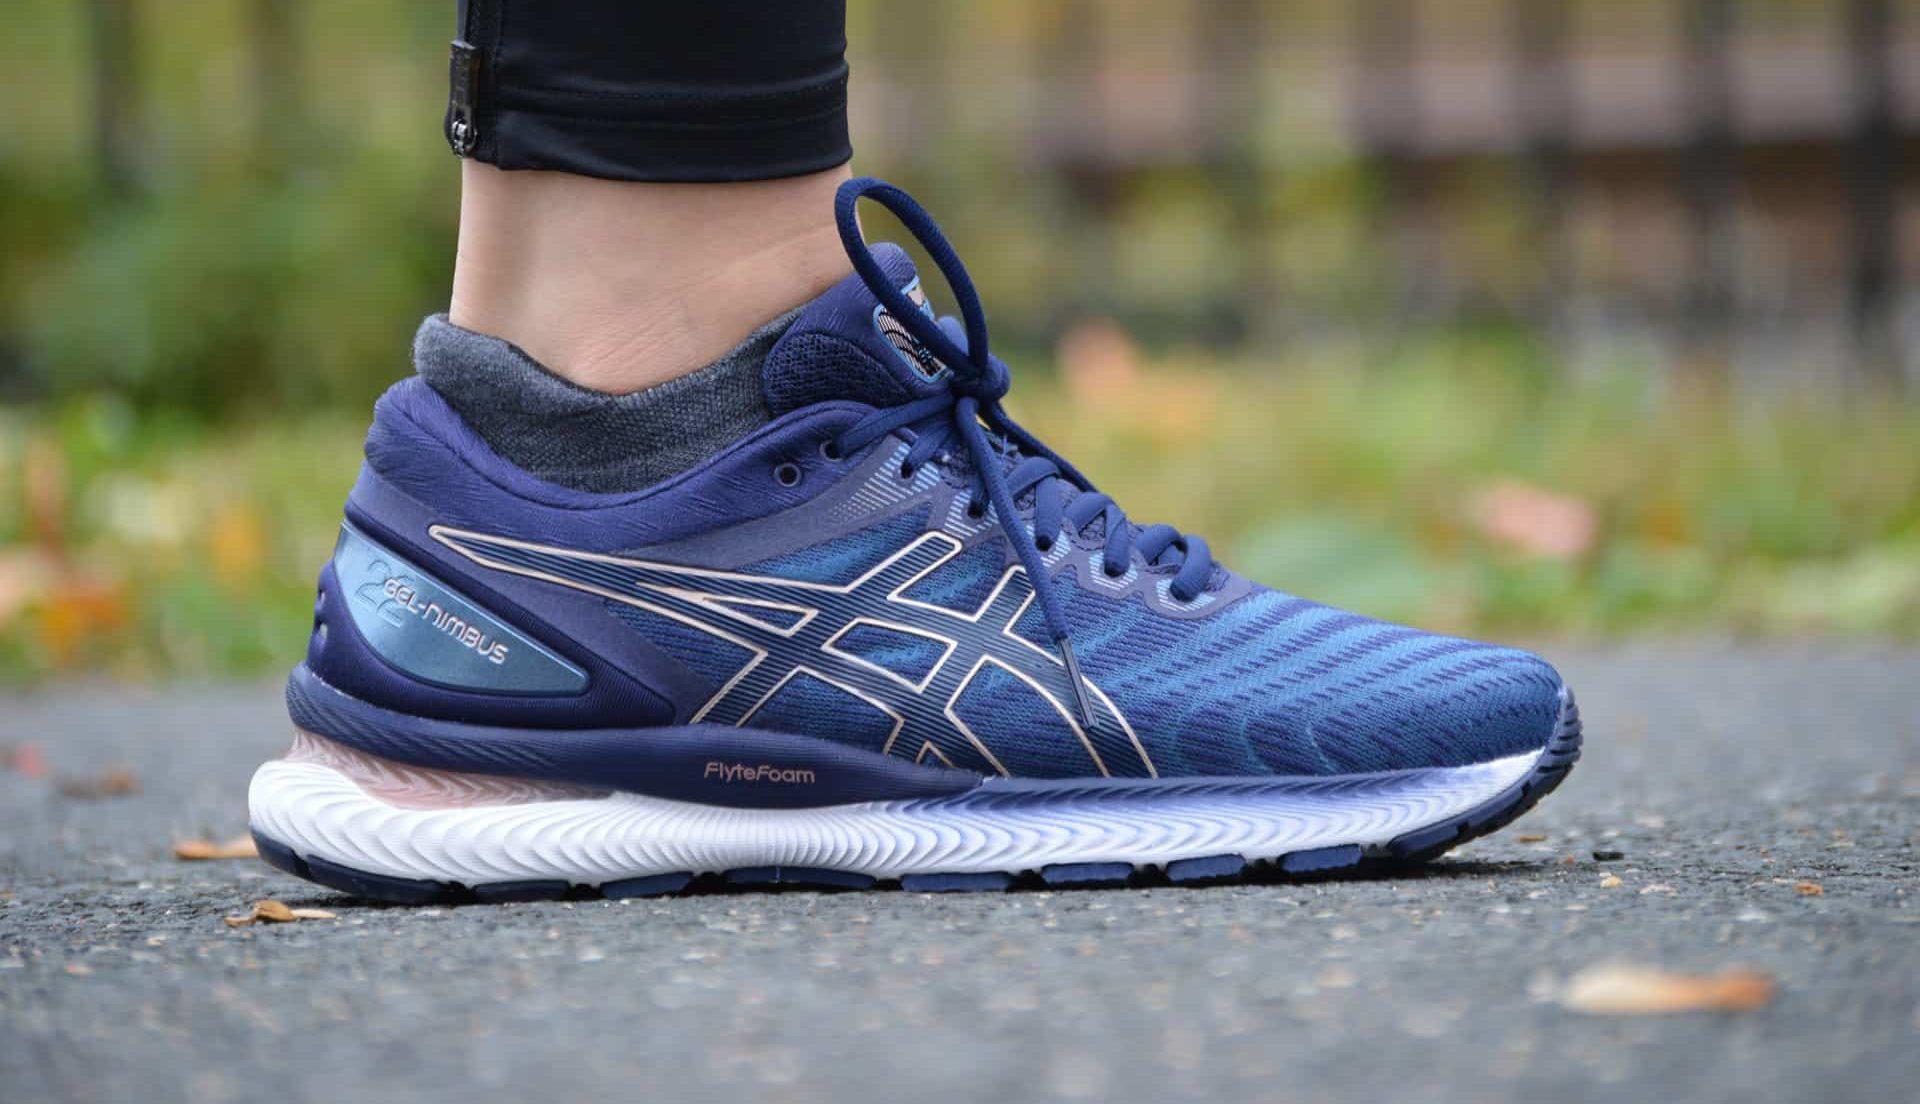 ASICS Running Shoes, Footwear, Clothing